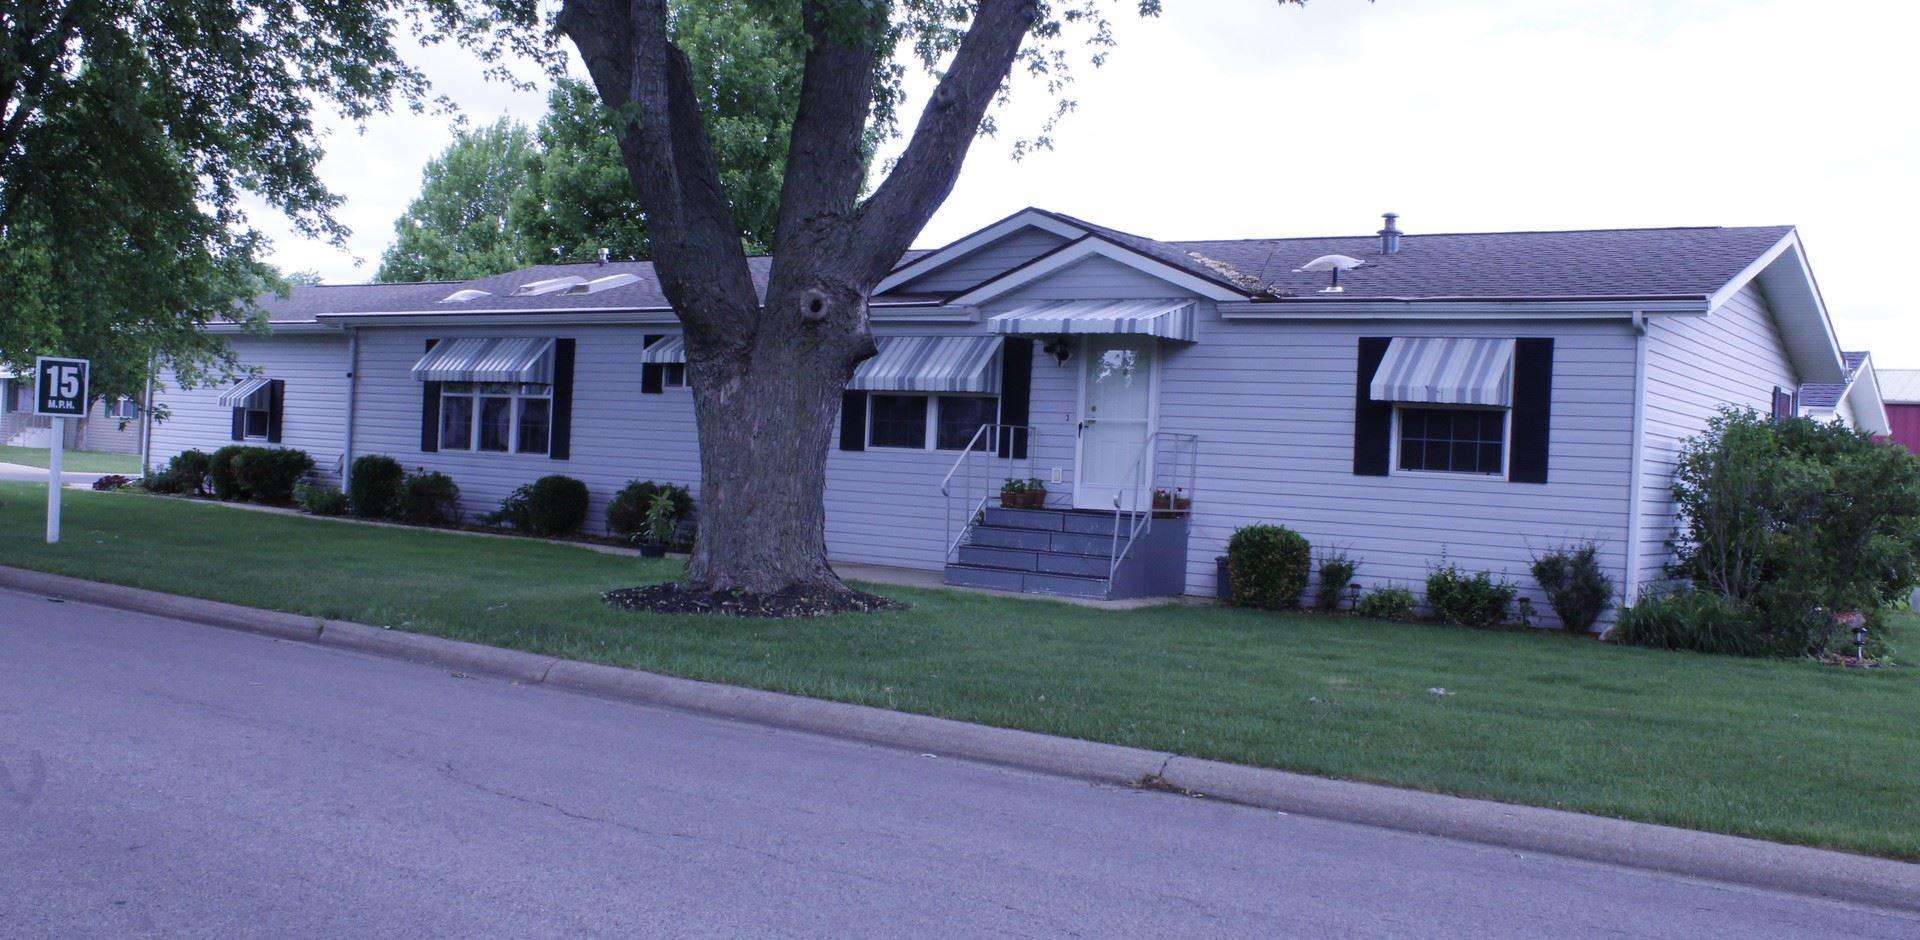 3806 Greenspire Court, Belvidere, IL 61008 - #: 11145672